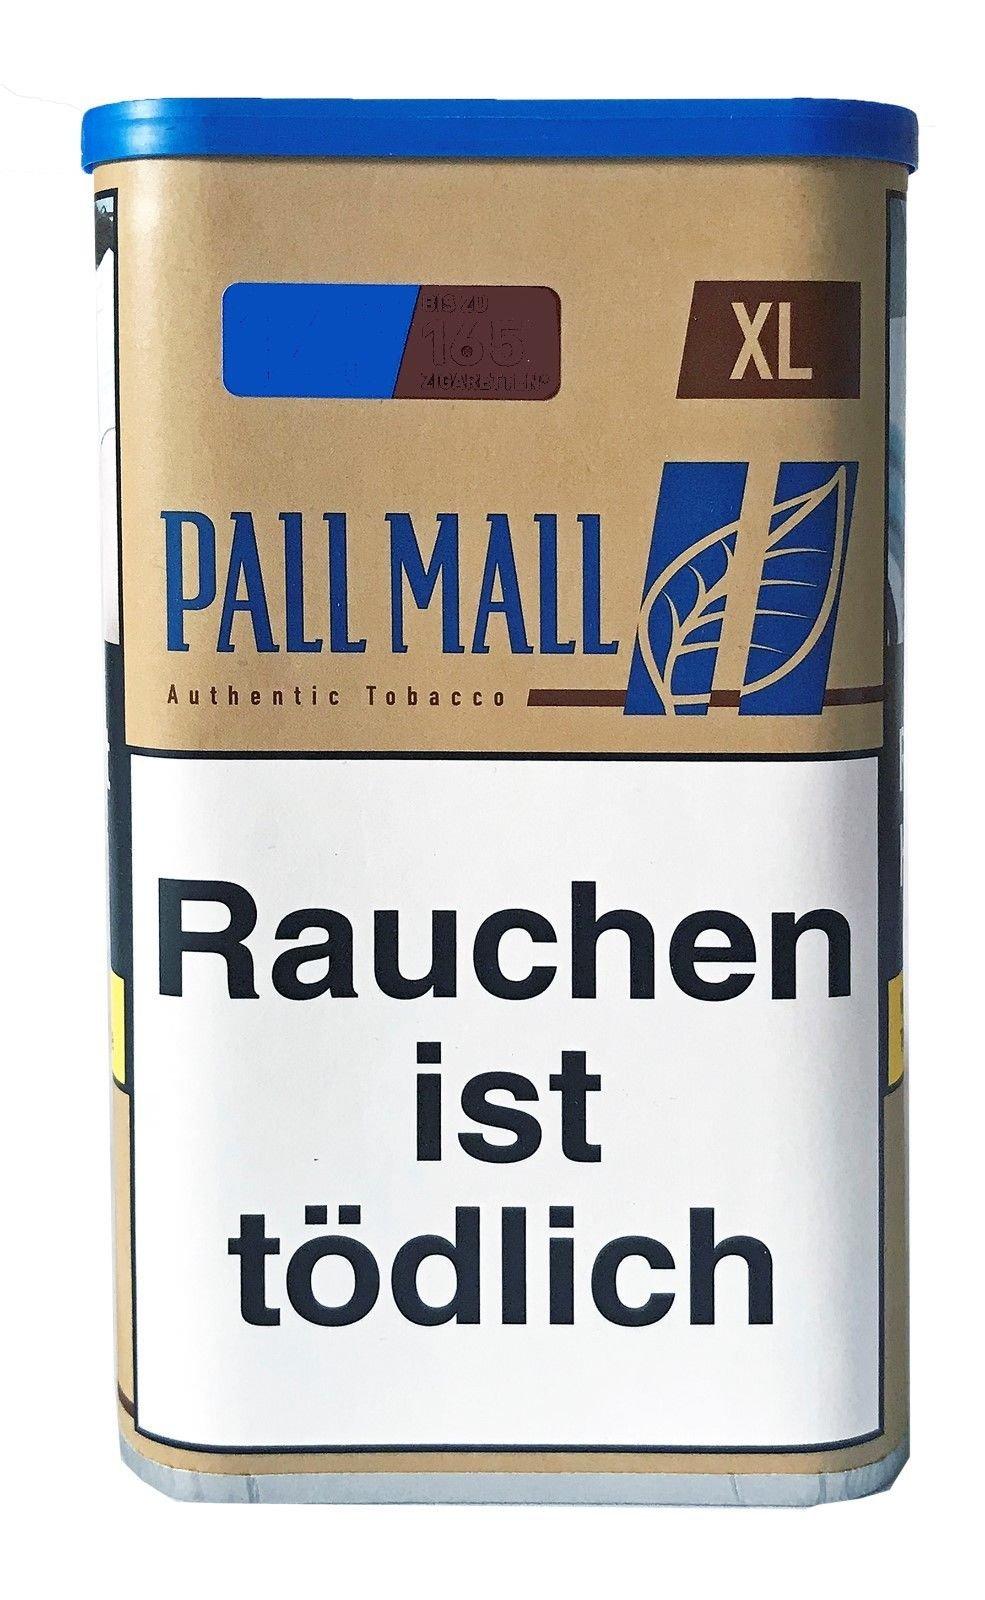 Pall Mall Authentic Blue / Blau XL Dose Zigarettentabak/Stopftabak Inhalt 60g